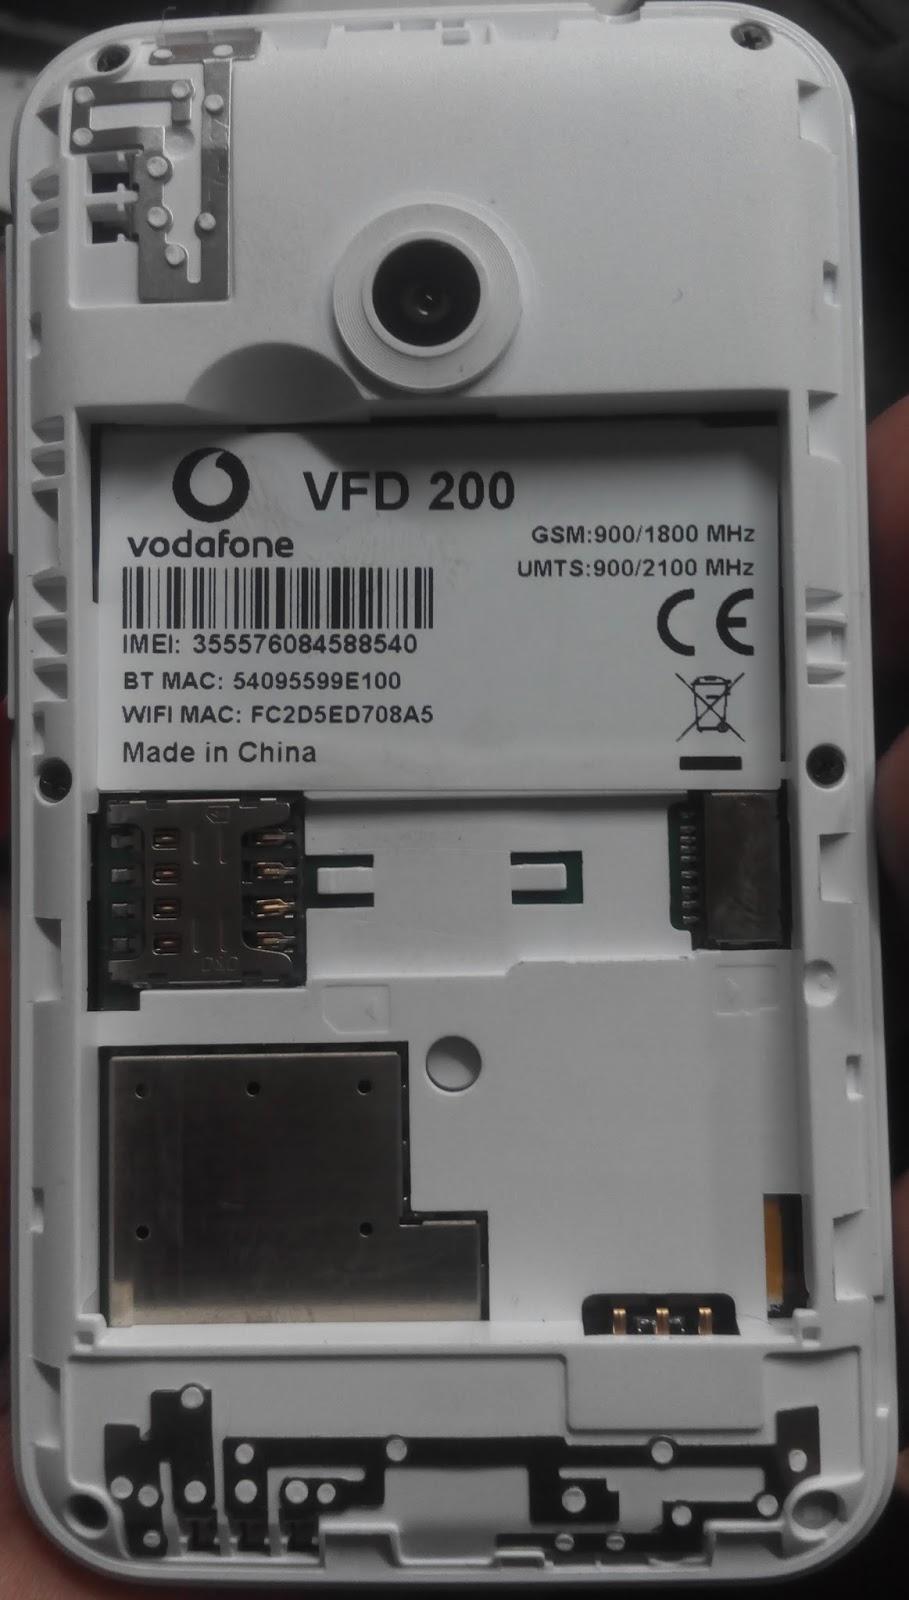 UNCOMON FILE SIDE: VODAFONE VFD 200 SC7731G FLASH FILE OFFICIAL